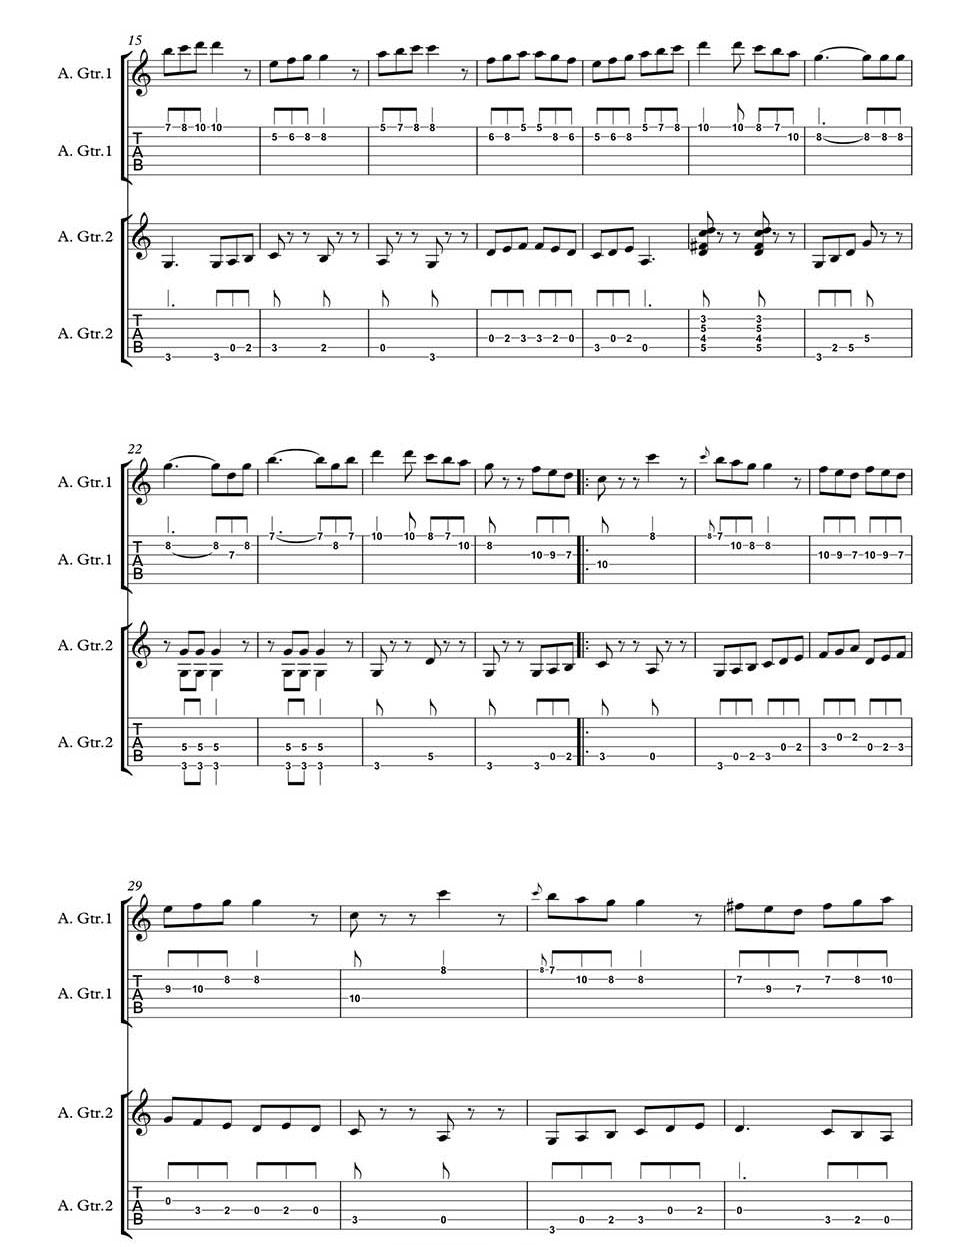 Trumpton Fireman By Freddie Phillips Arranged For Guitar Duet By